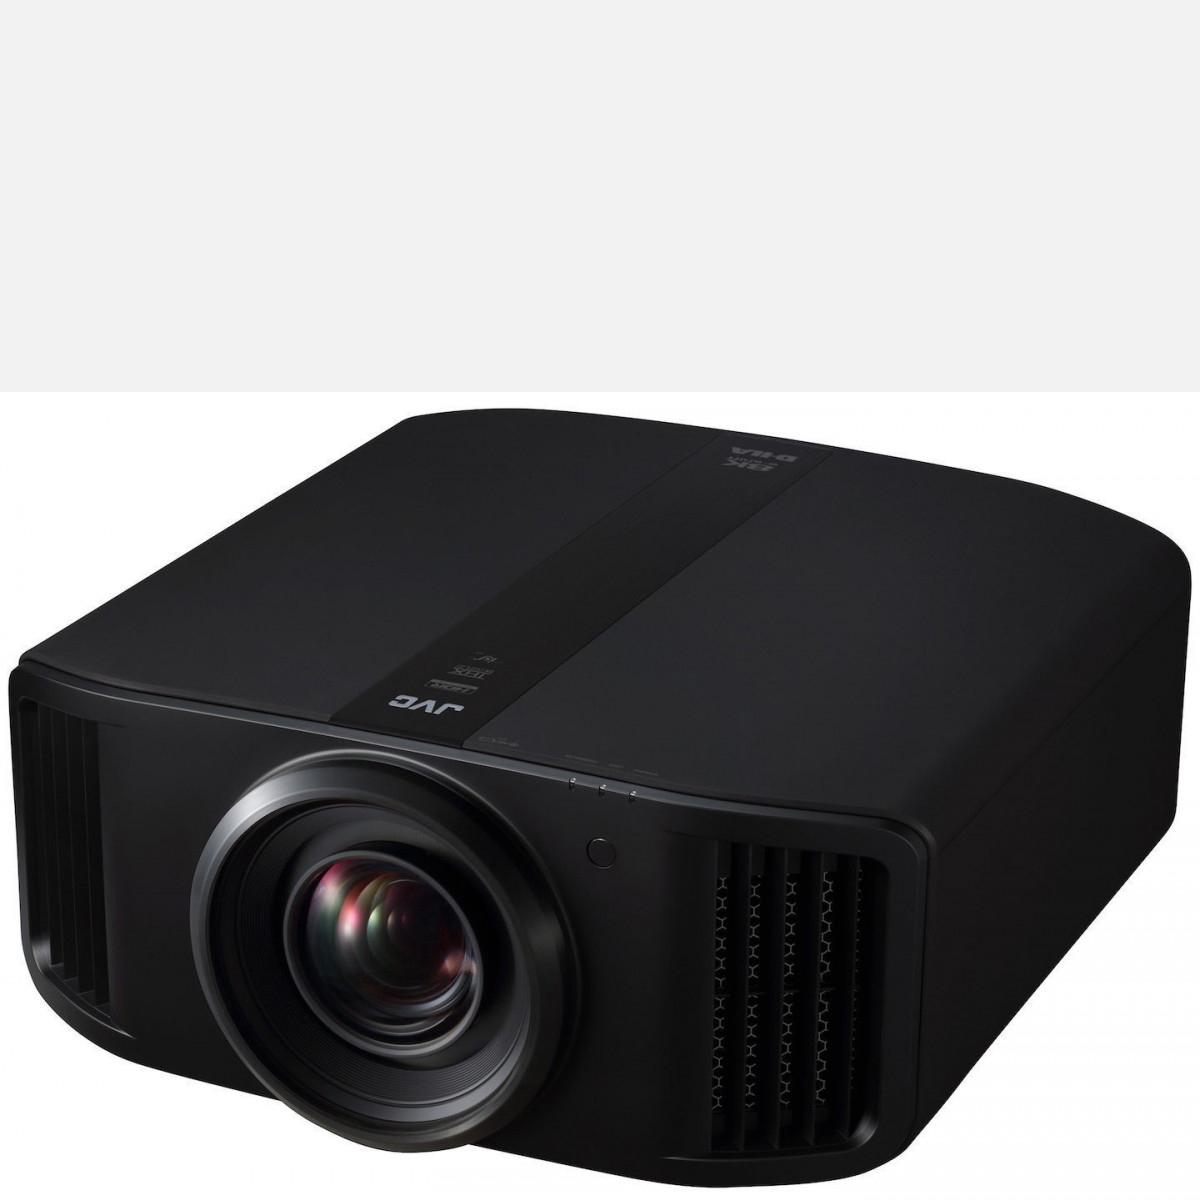 JVC DLA-NX9B UHD Projector